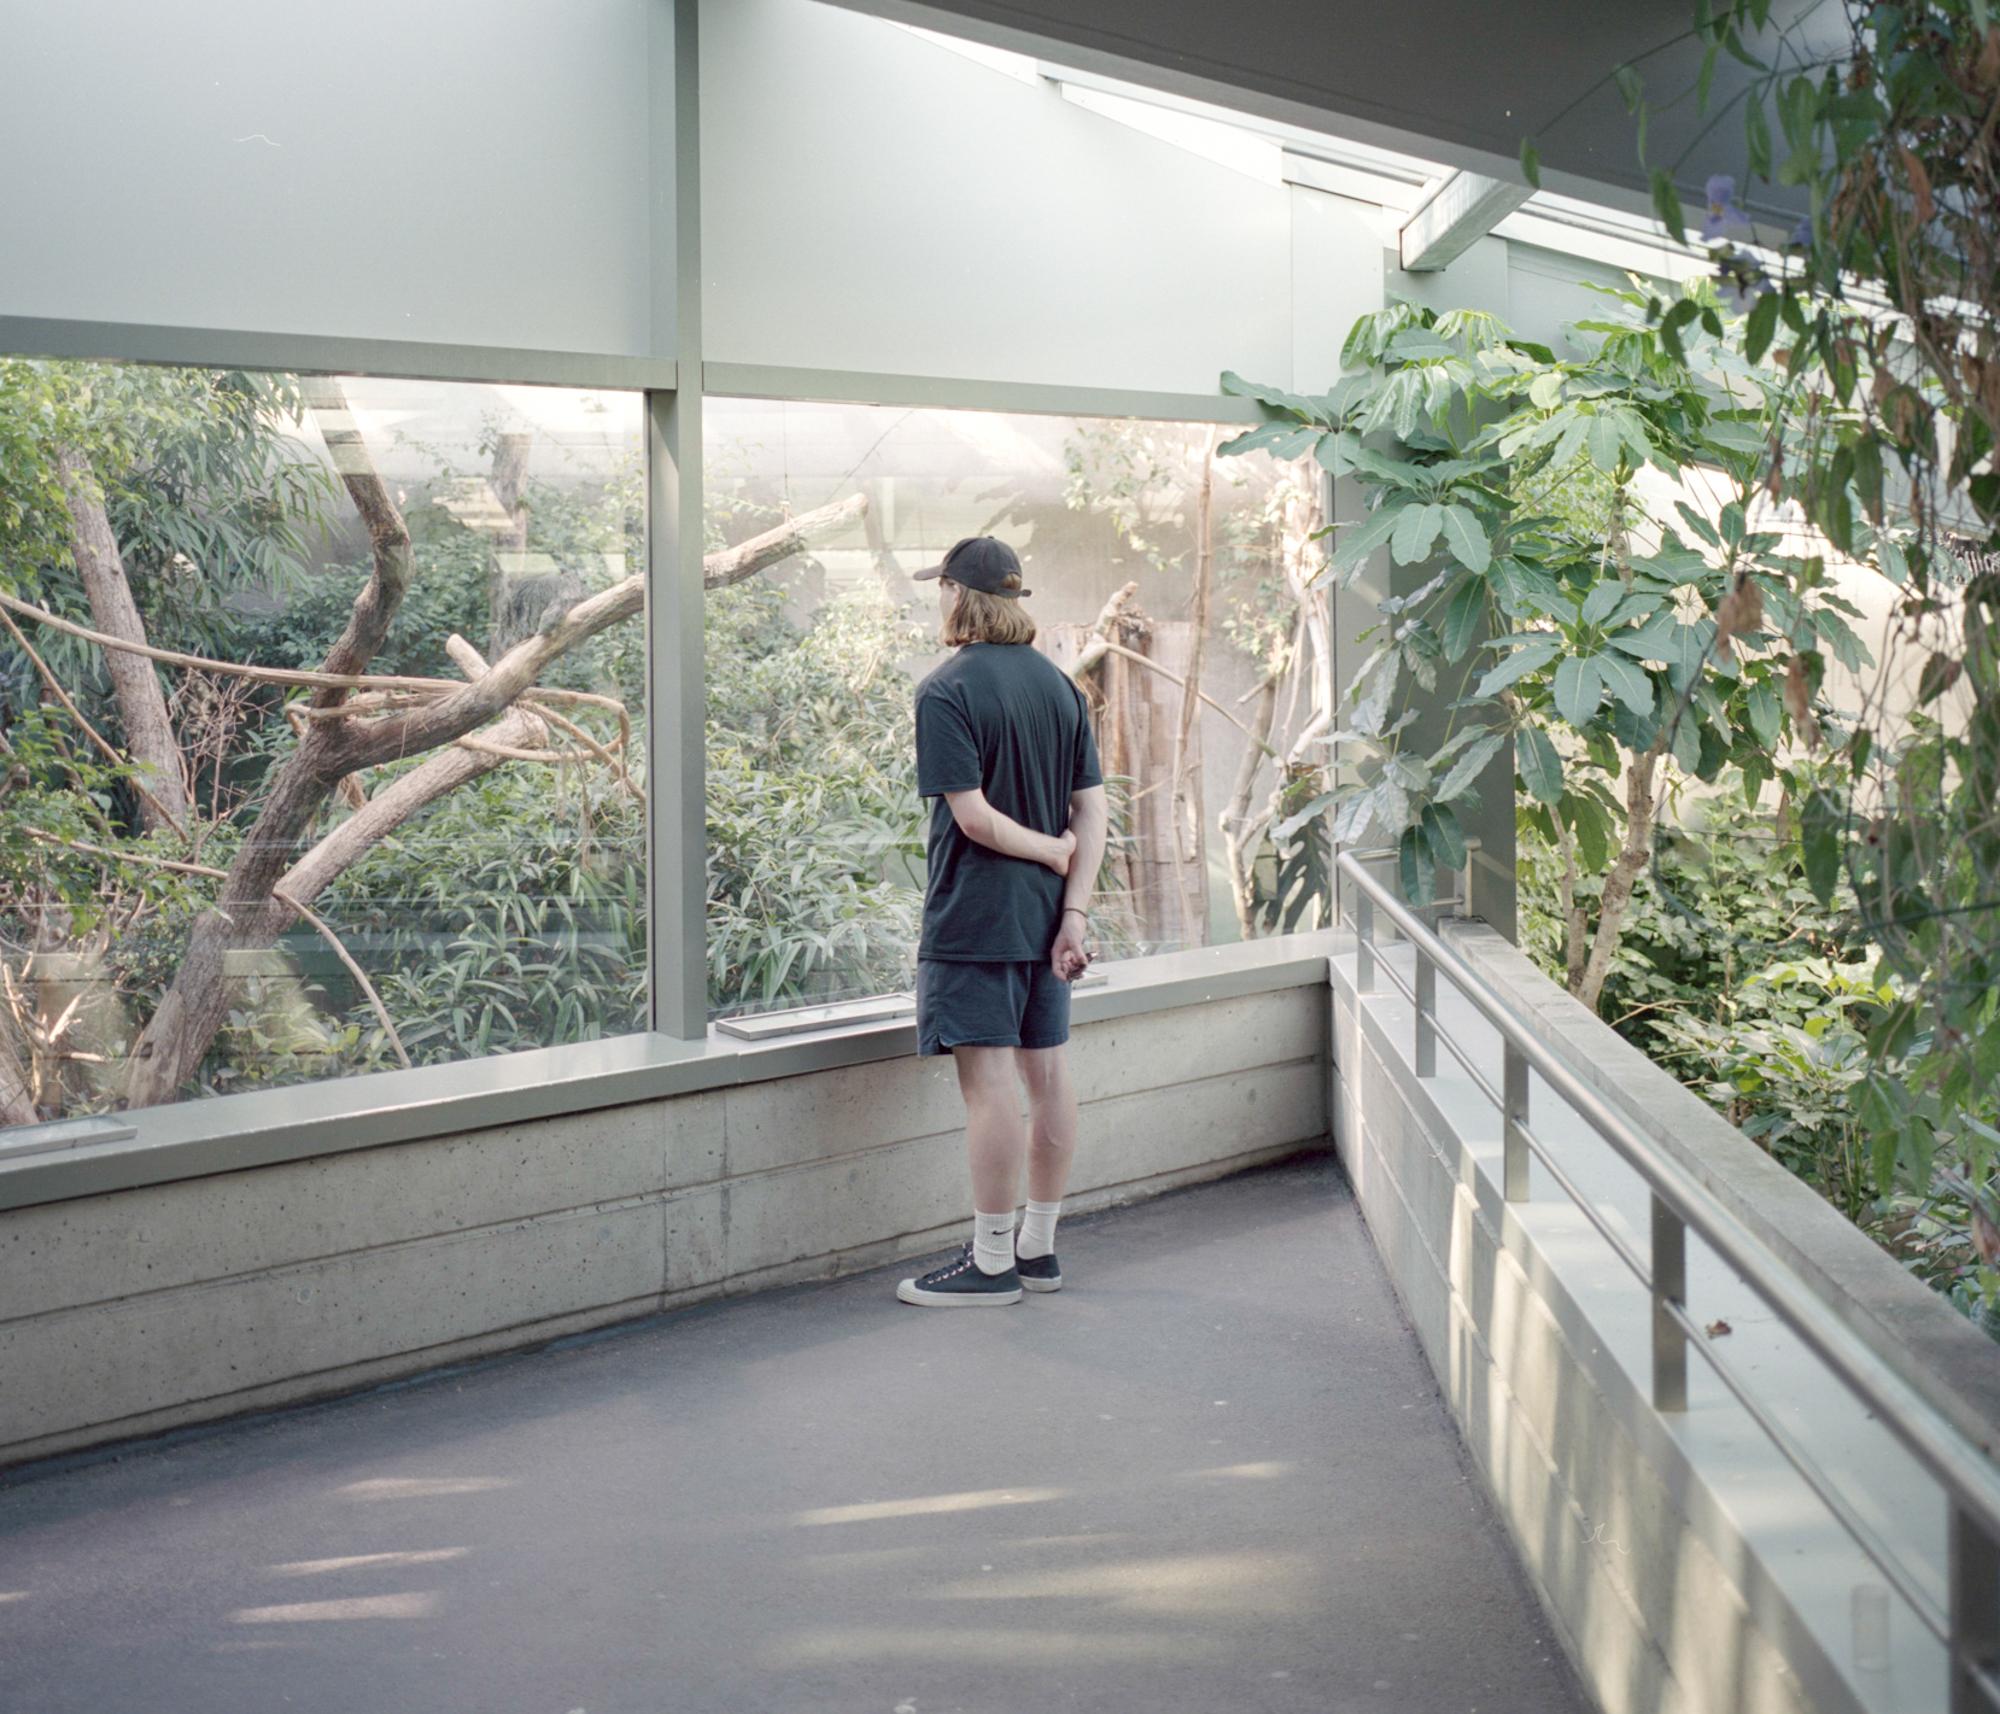 107_Zoo.jpg